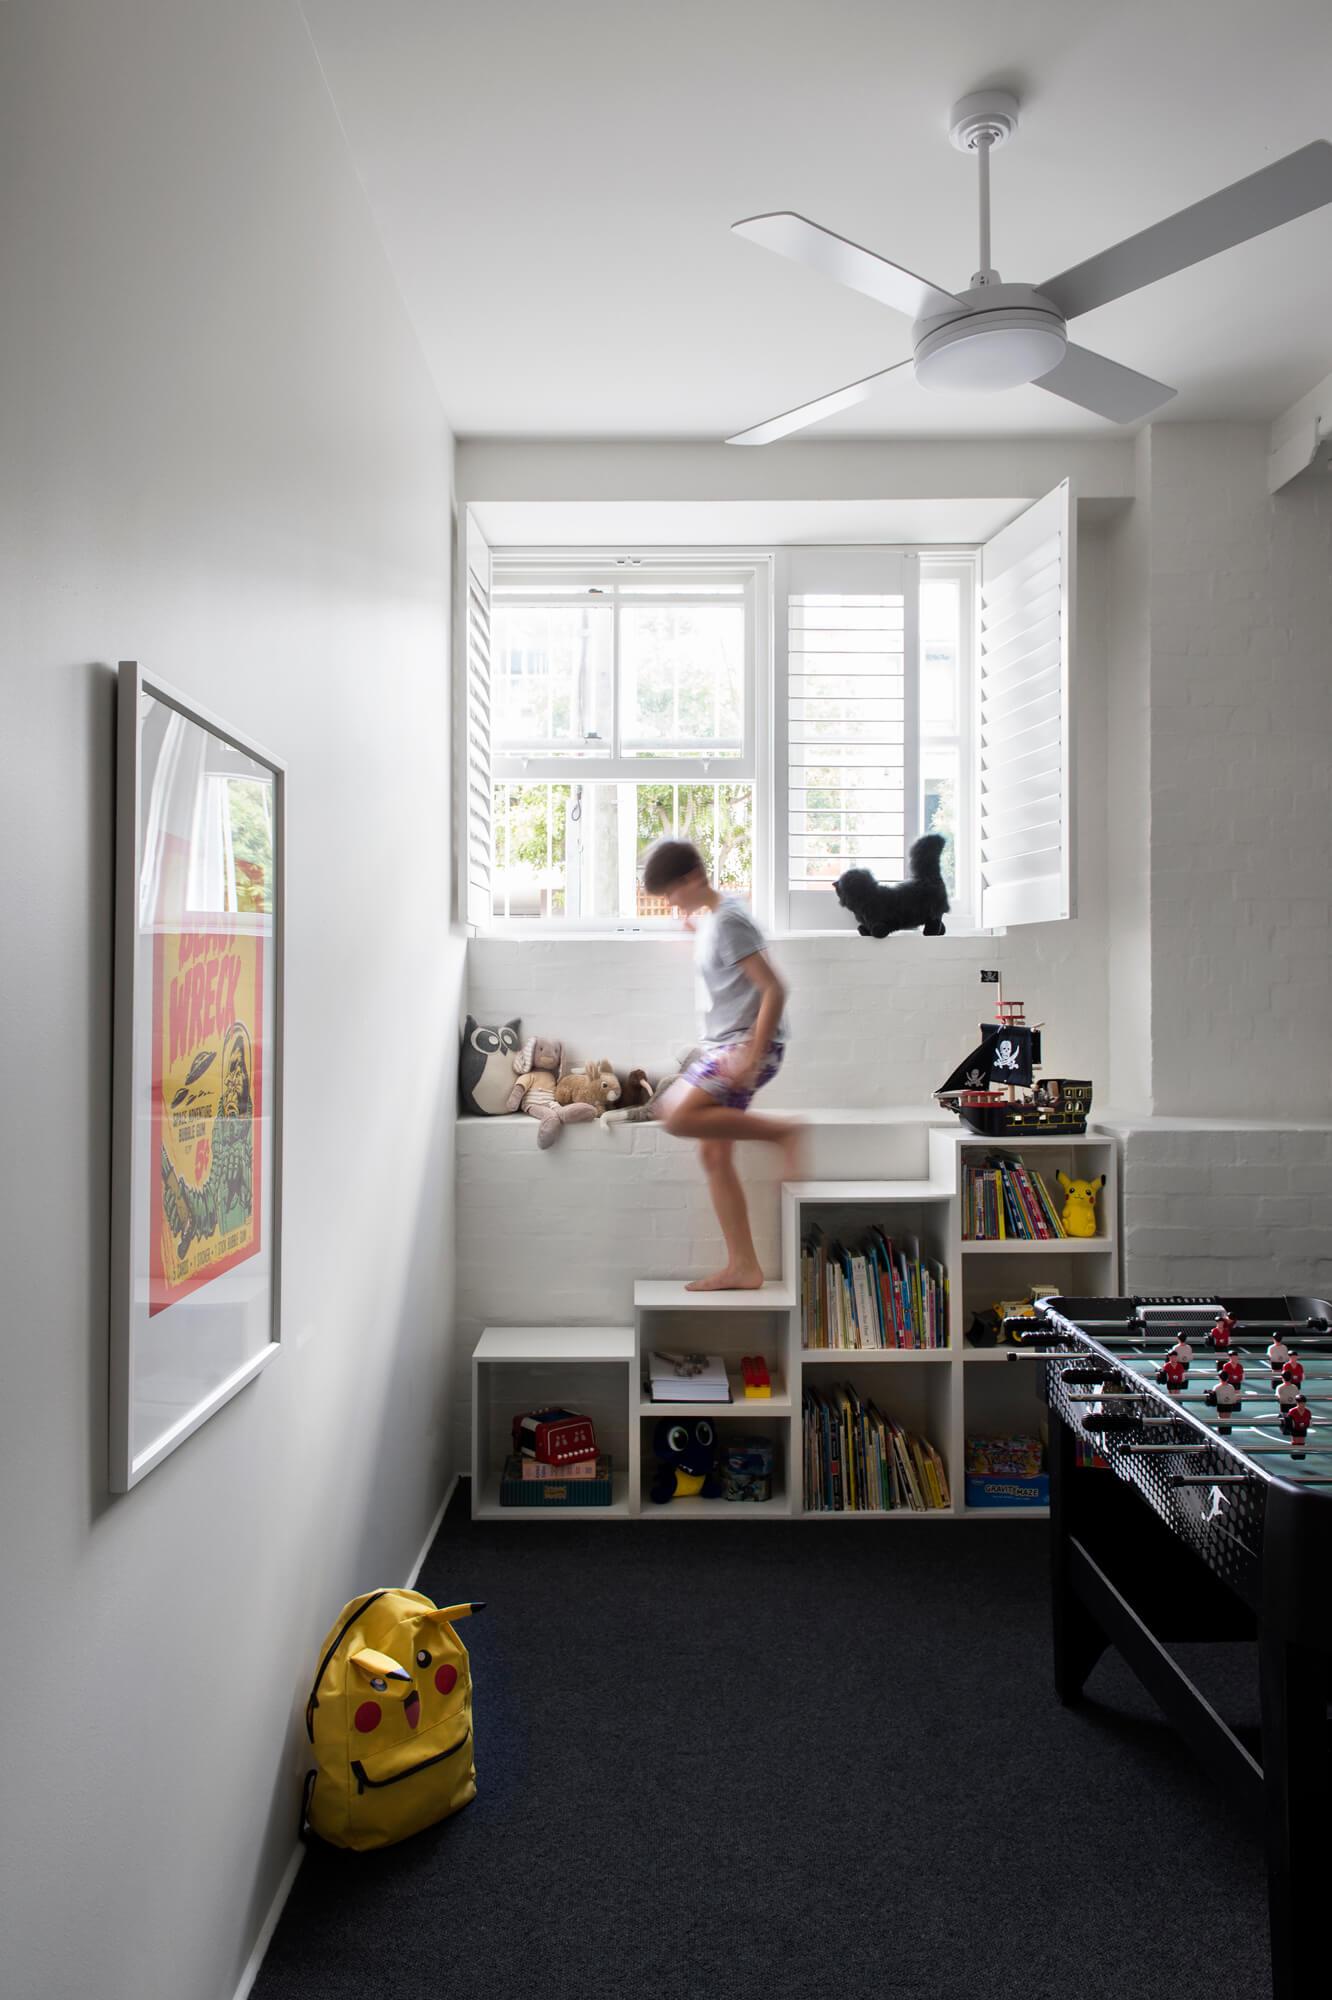 georgia-cannon-interior-designer-brisbane-project-m4-house-13.jpg